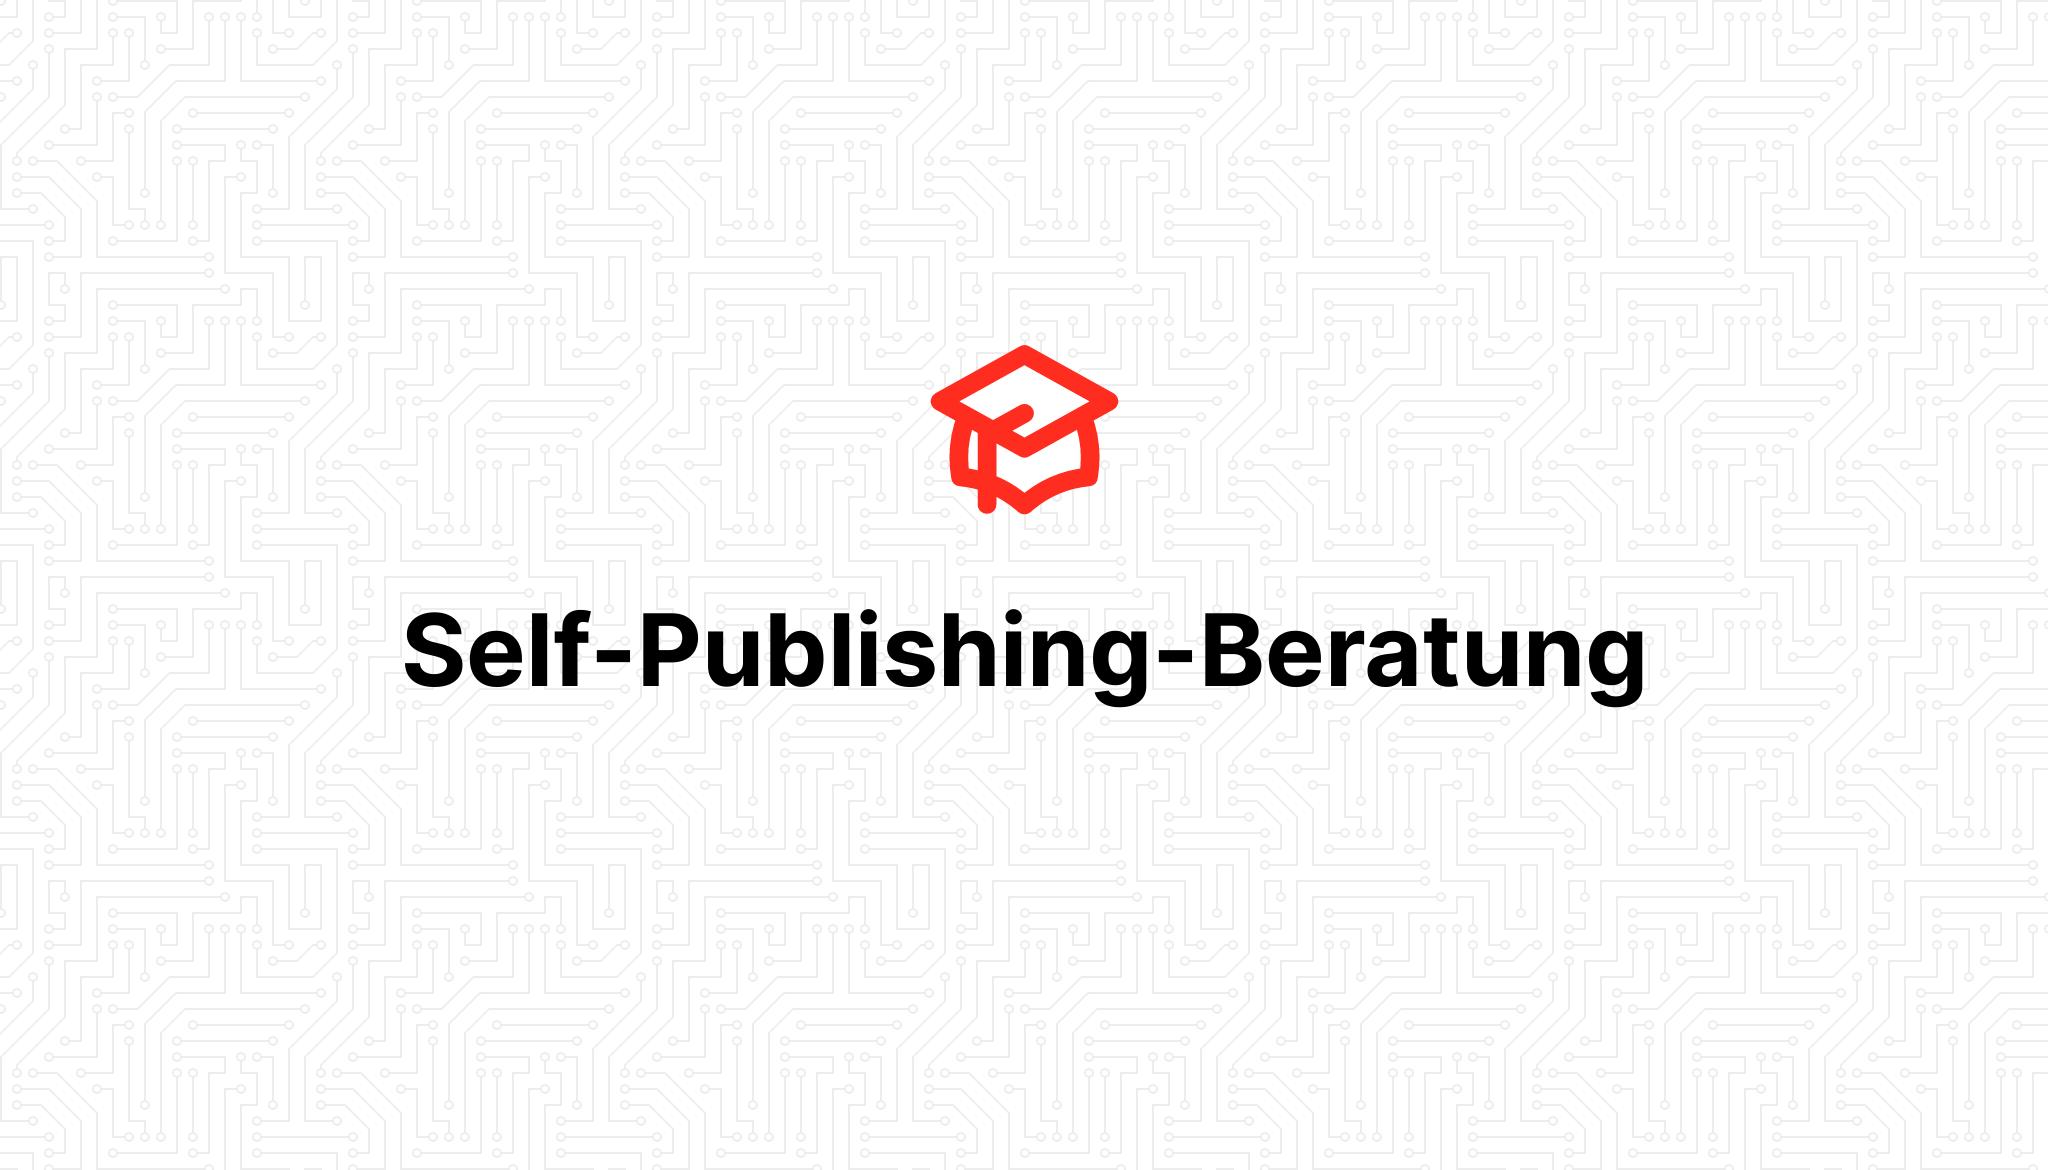 Felix Weber - Doktorand und SAP Consultant